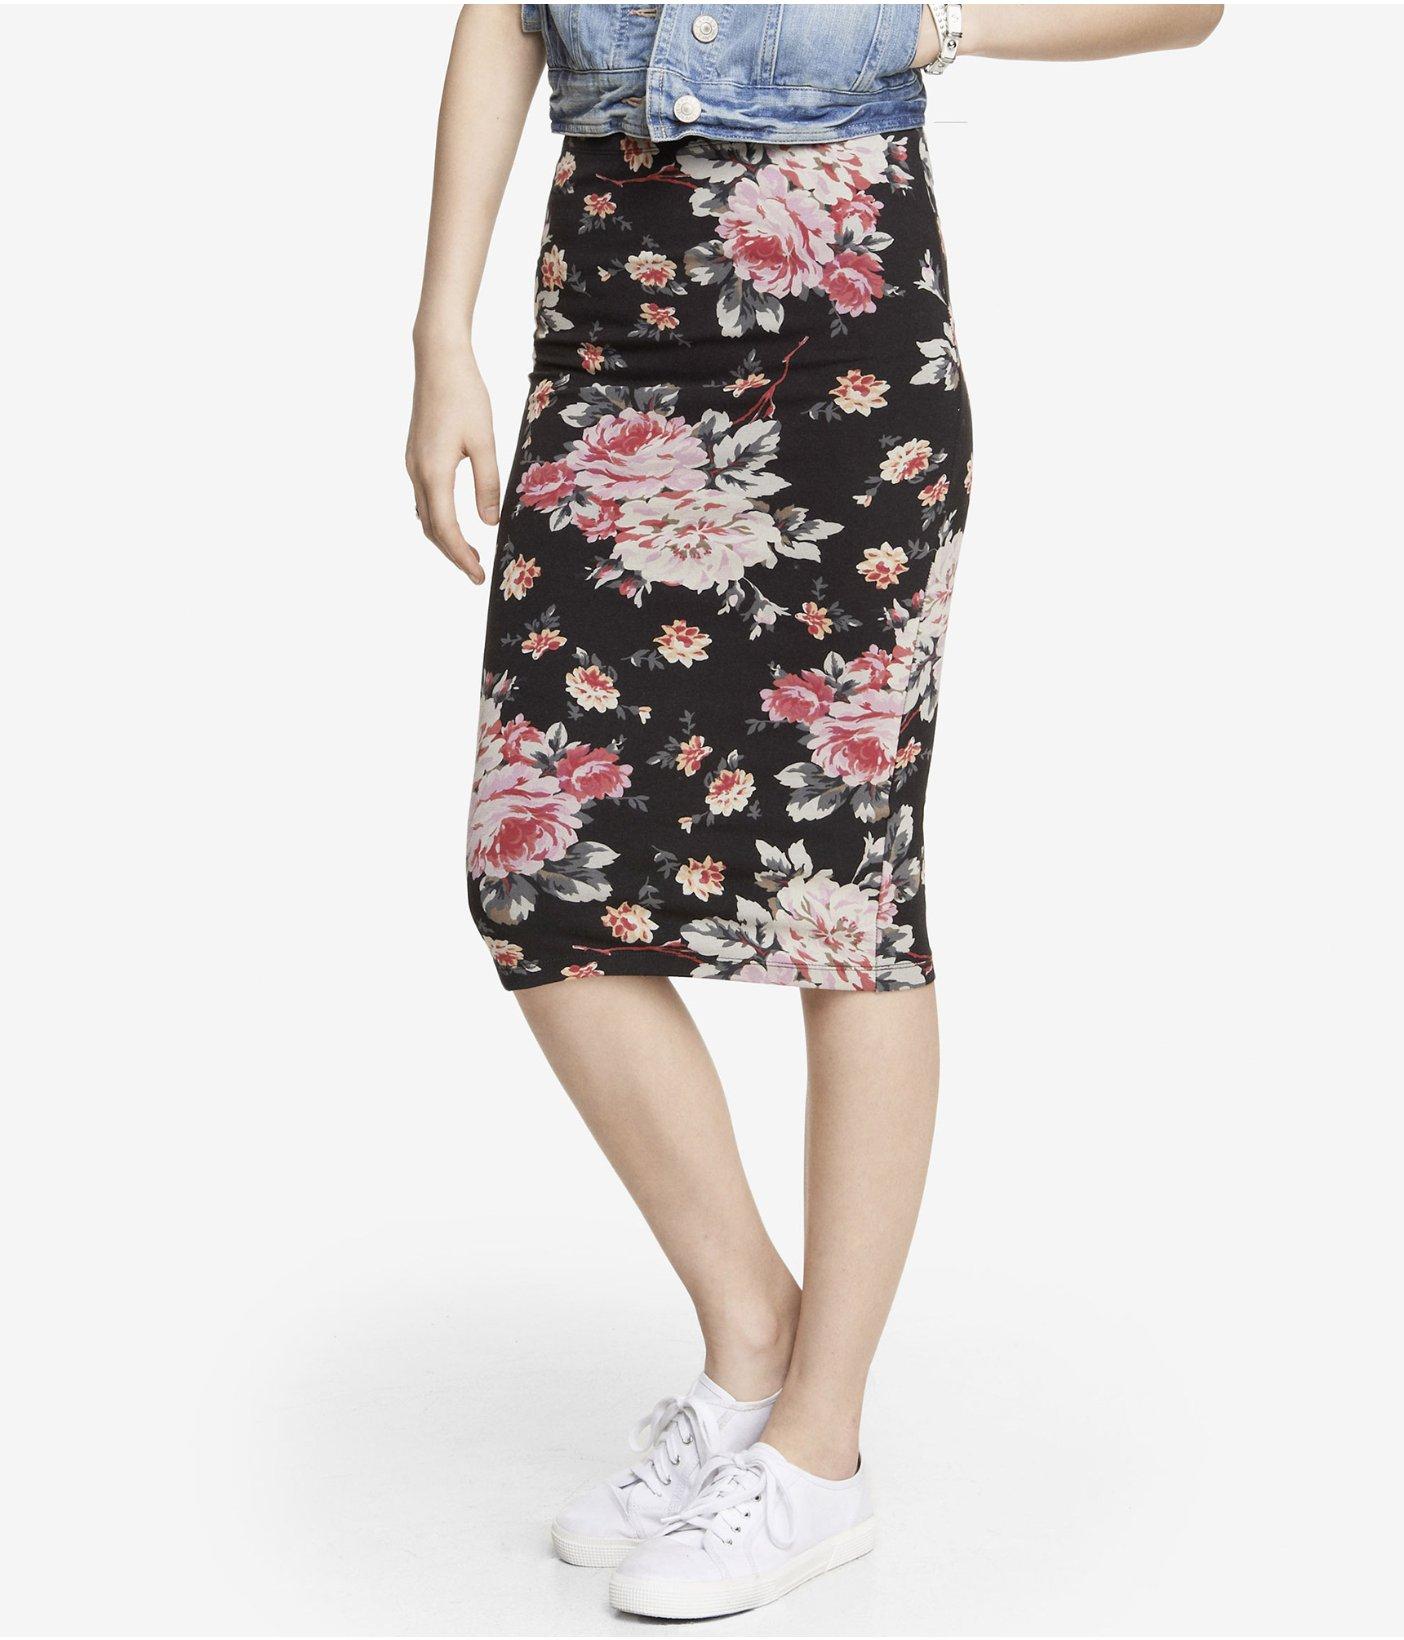 floral pencil skirt - photo #31